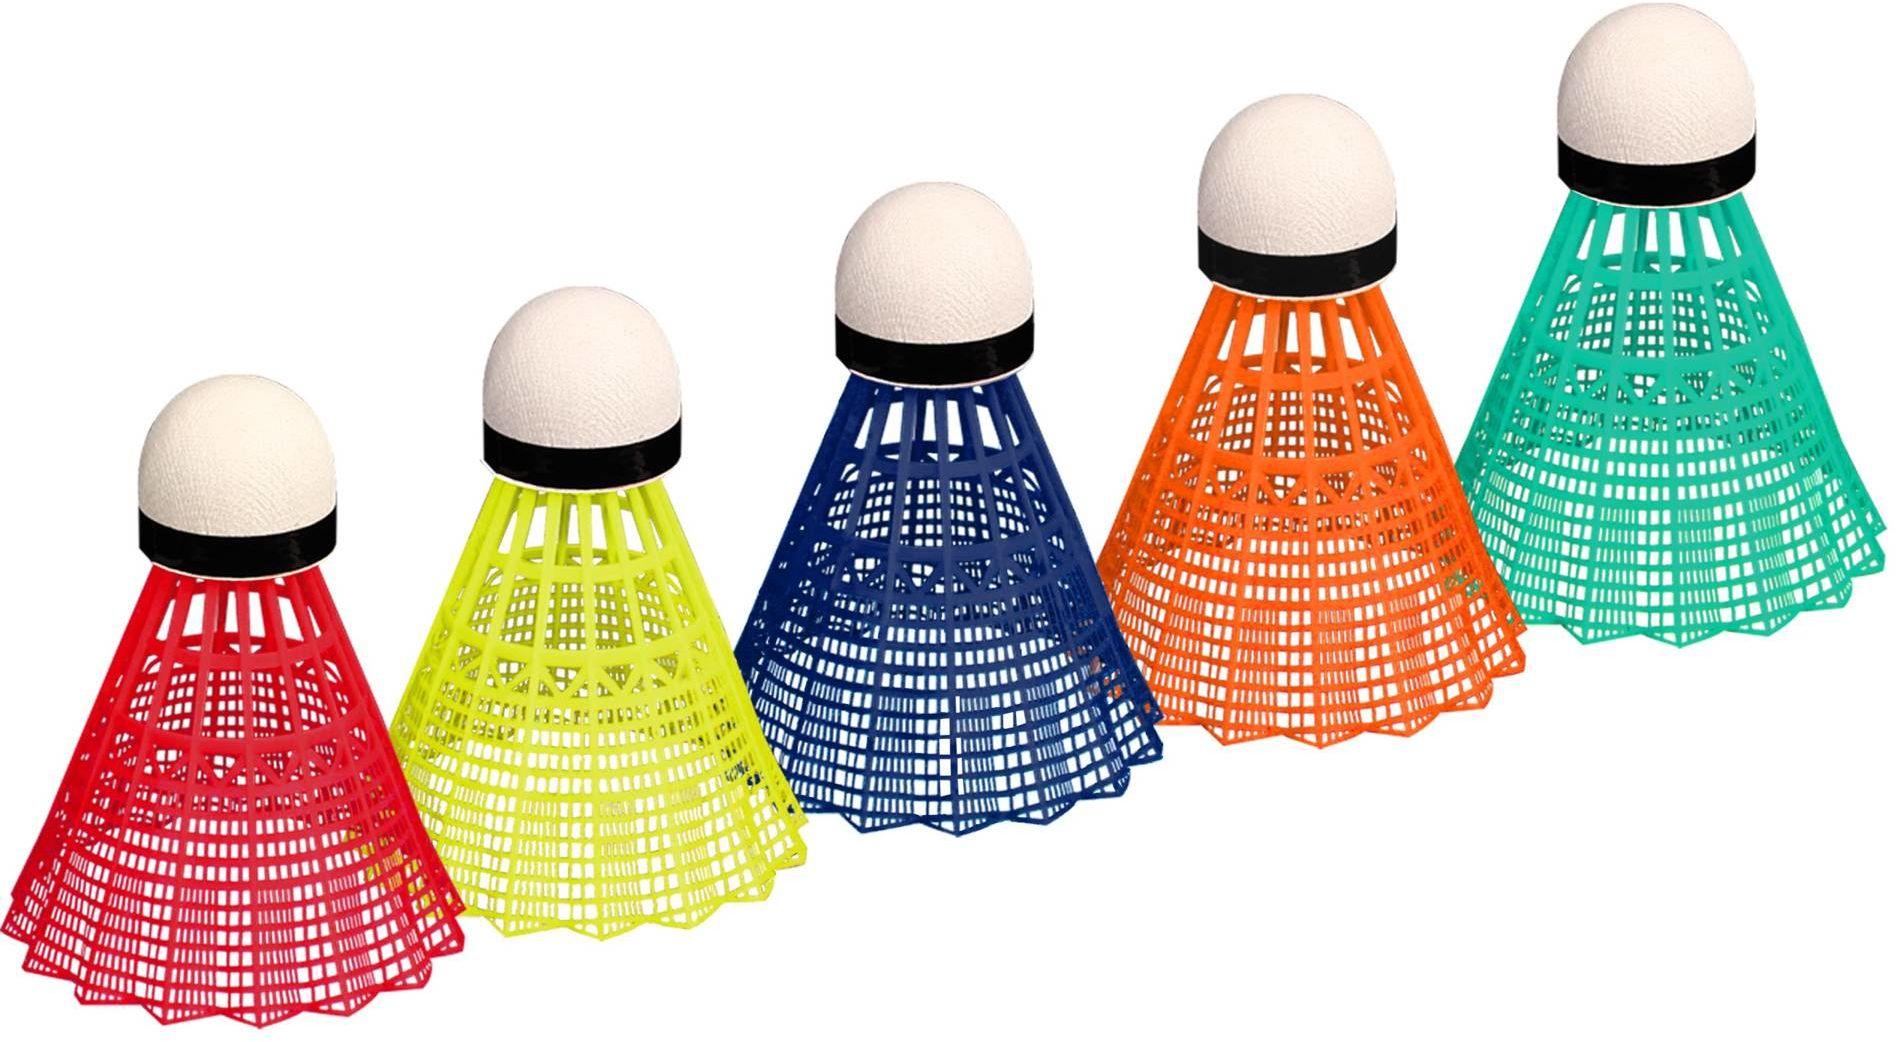 Lotki do badmintona kolorowe Avento x5